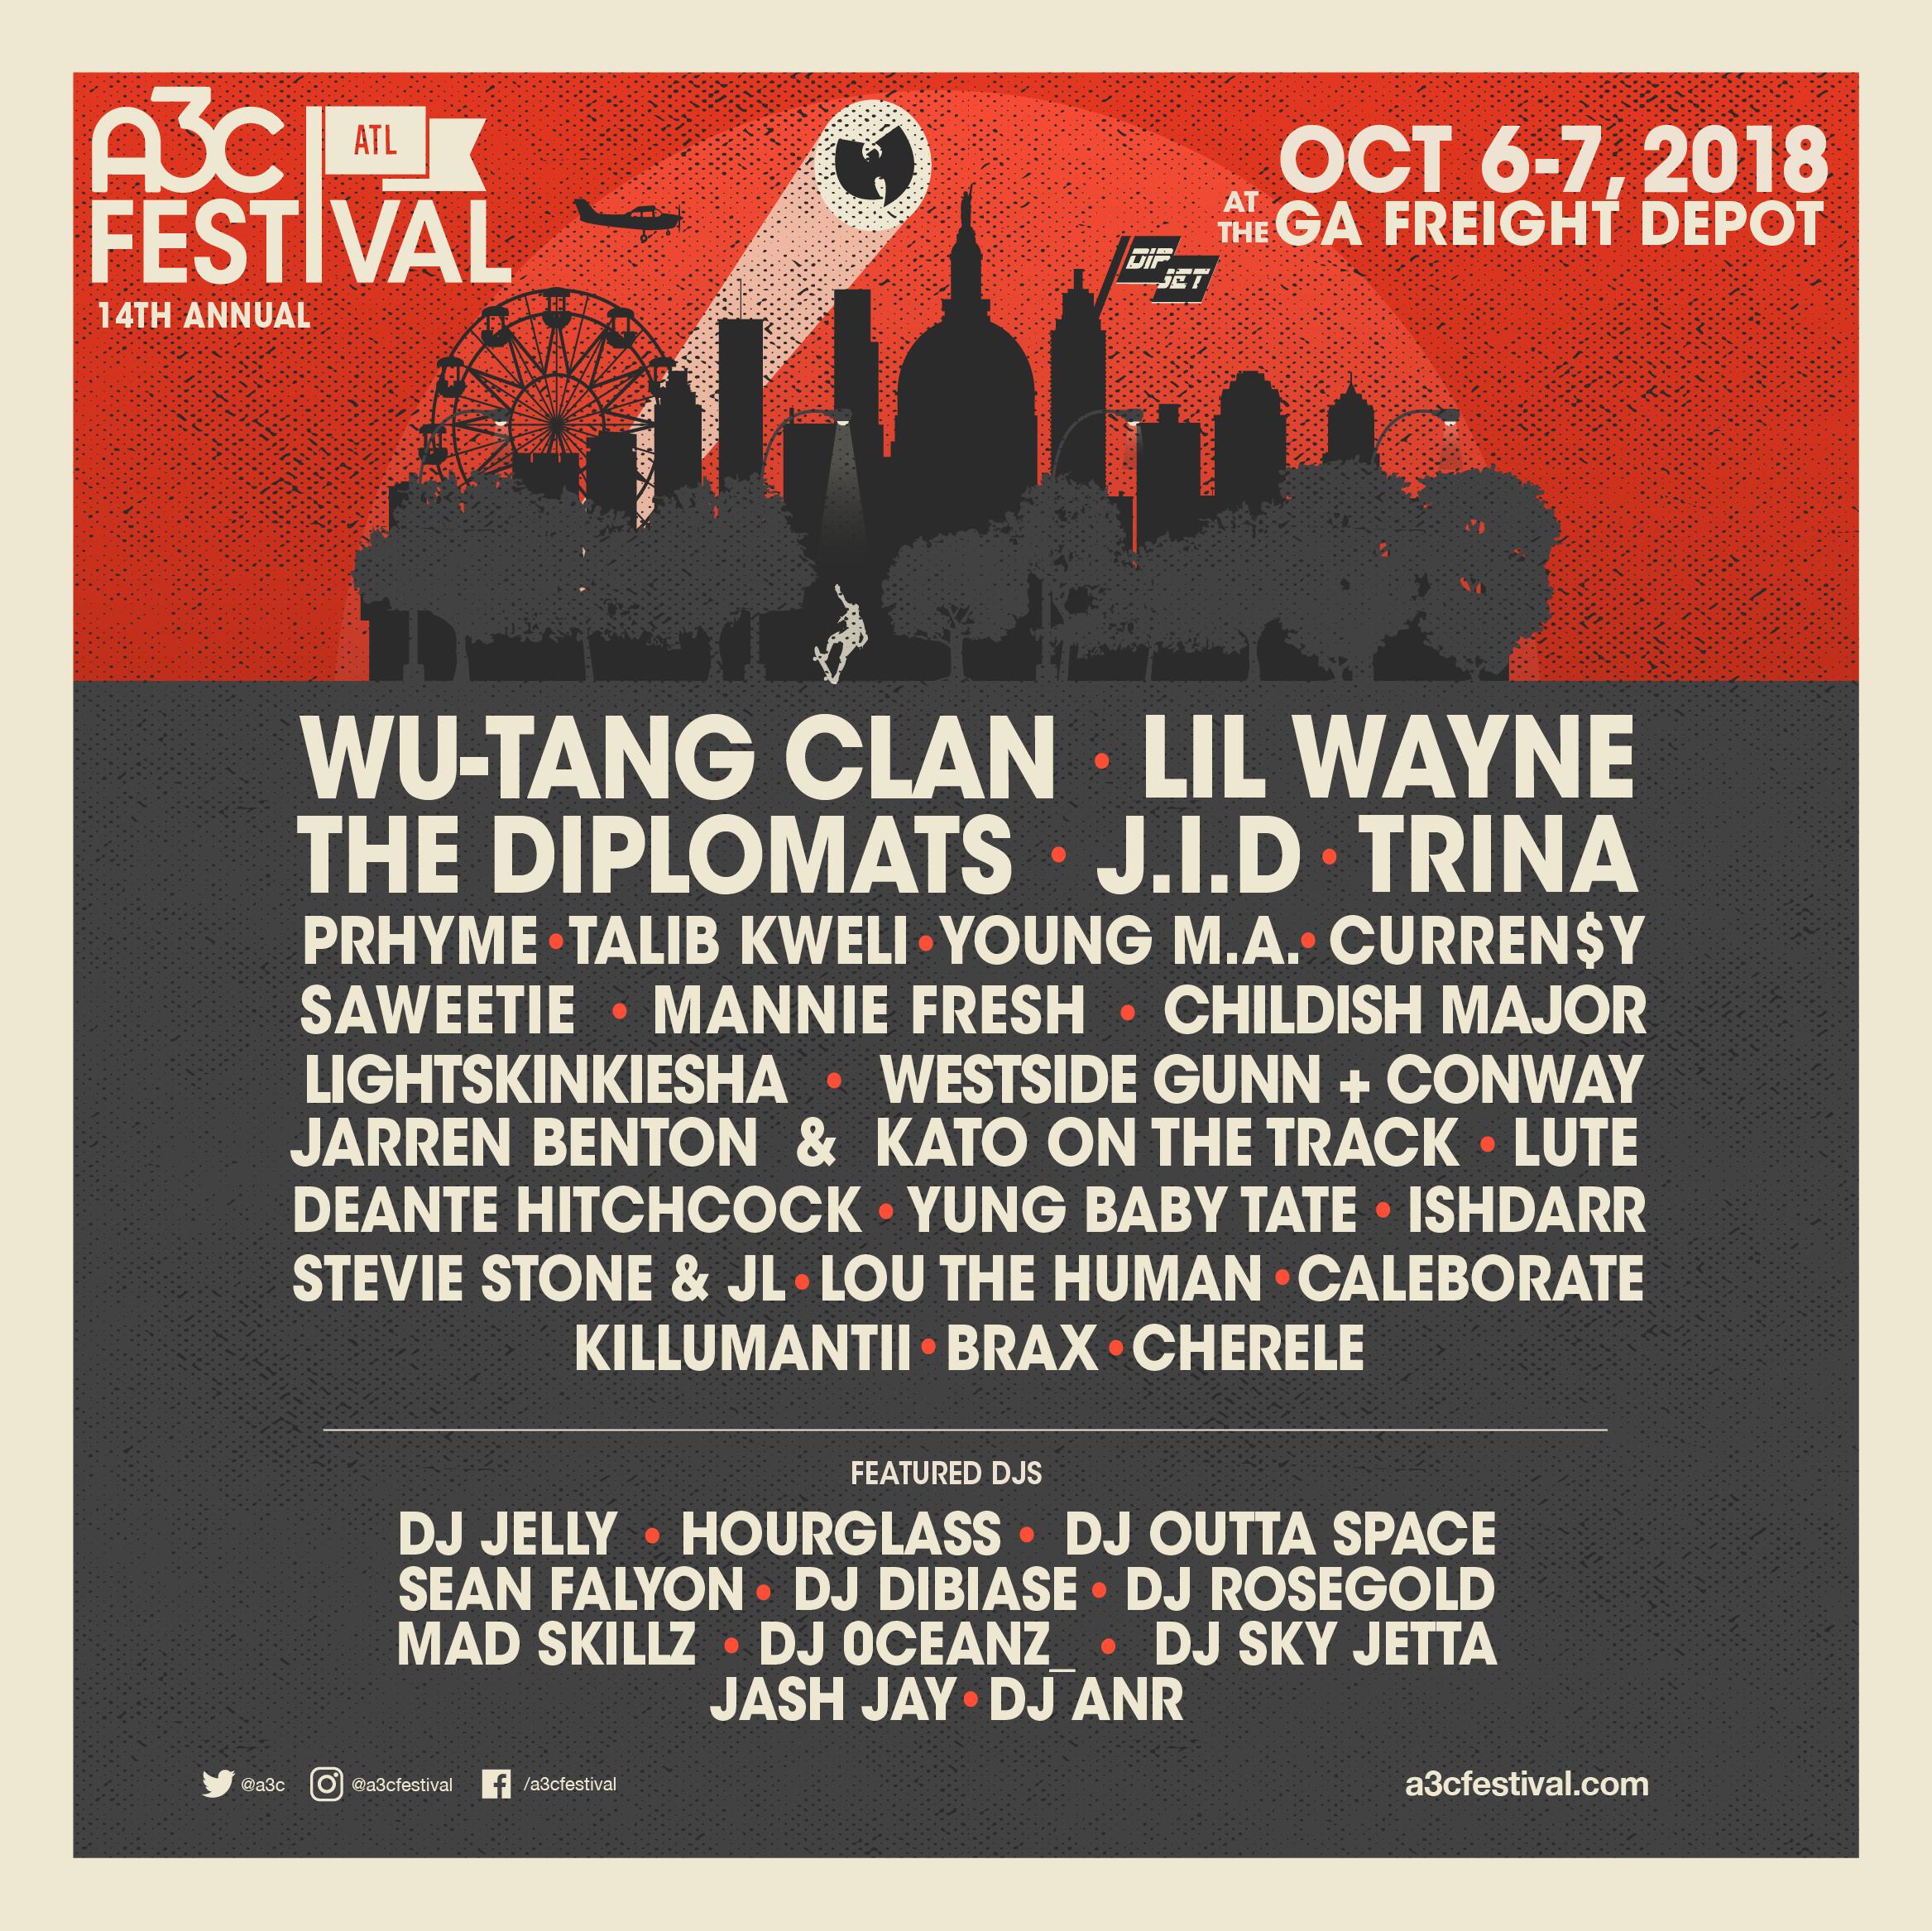 2018 A3C Festival IG - FINAL